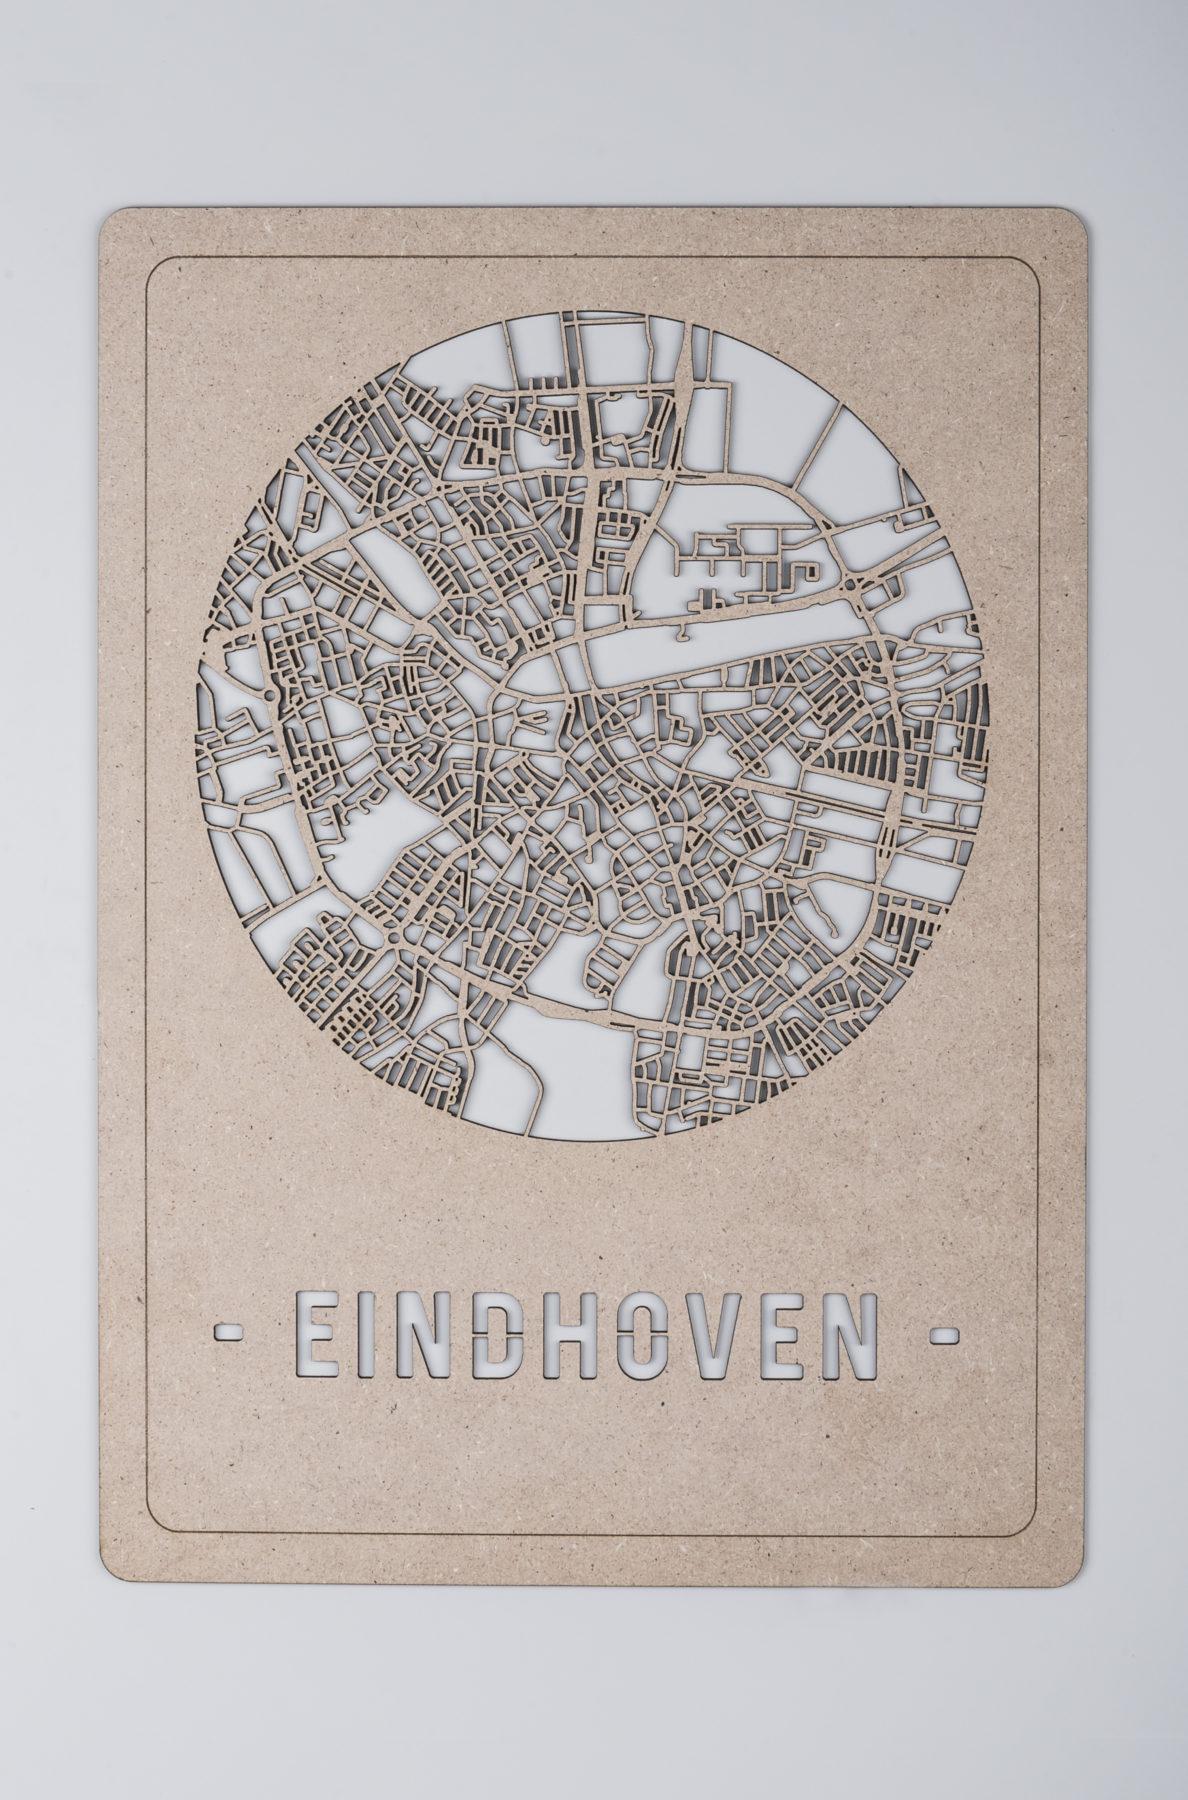 Eindhoven stadskaart hout